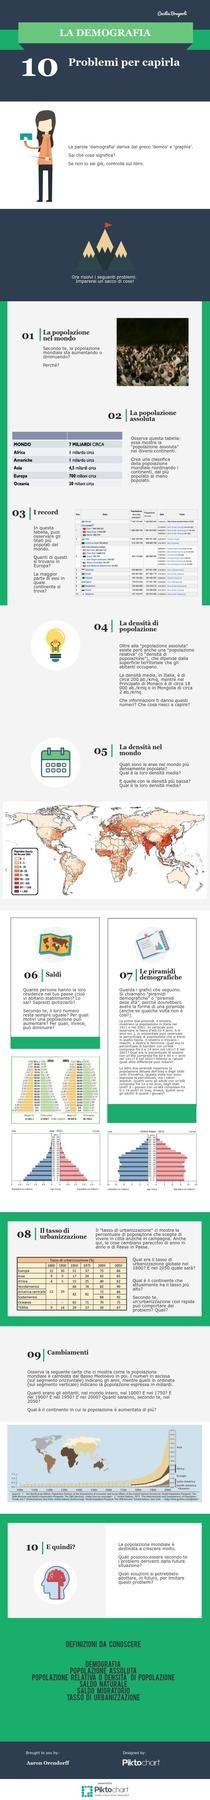 La demografia | Piktochart Infographic Editor